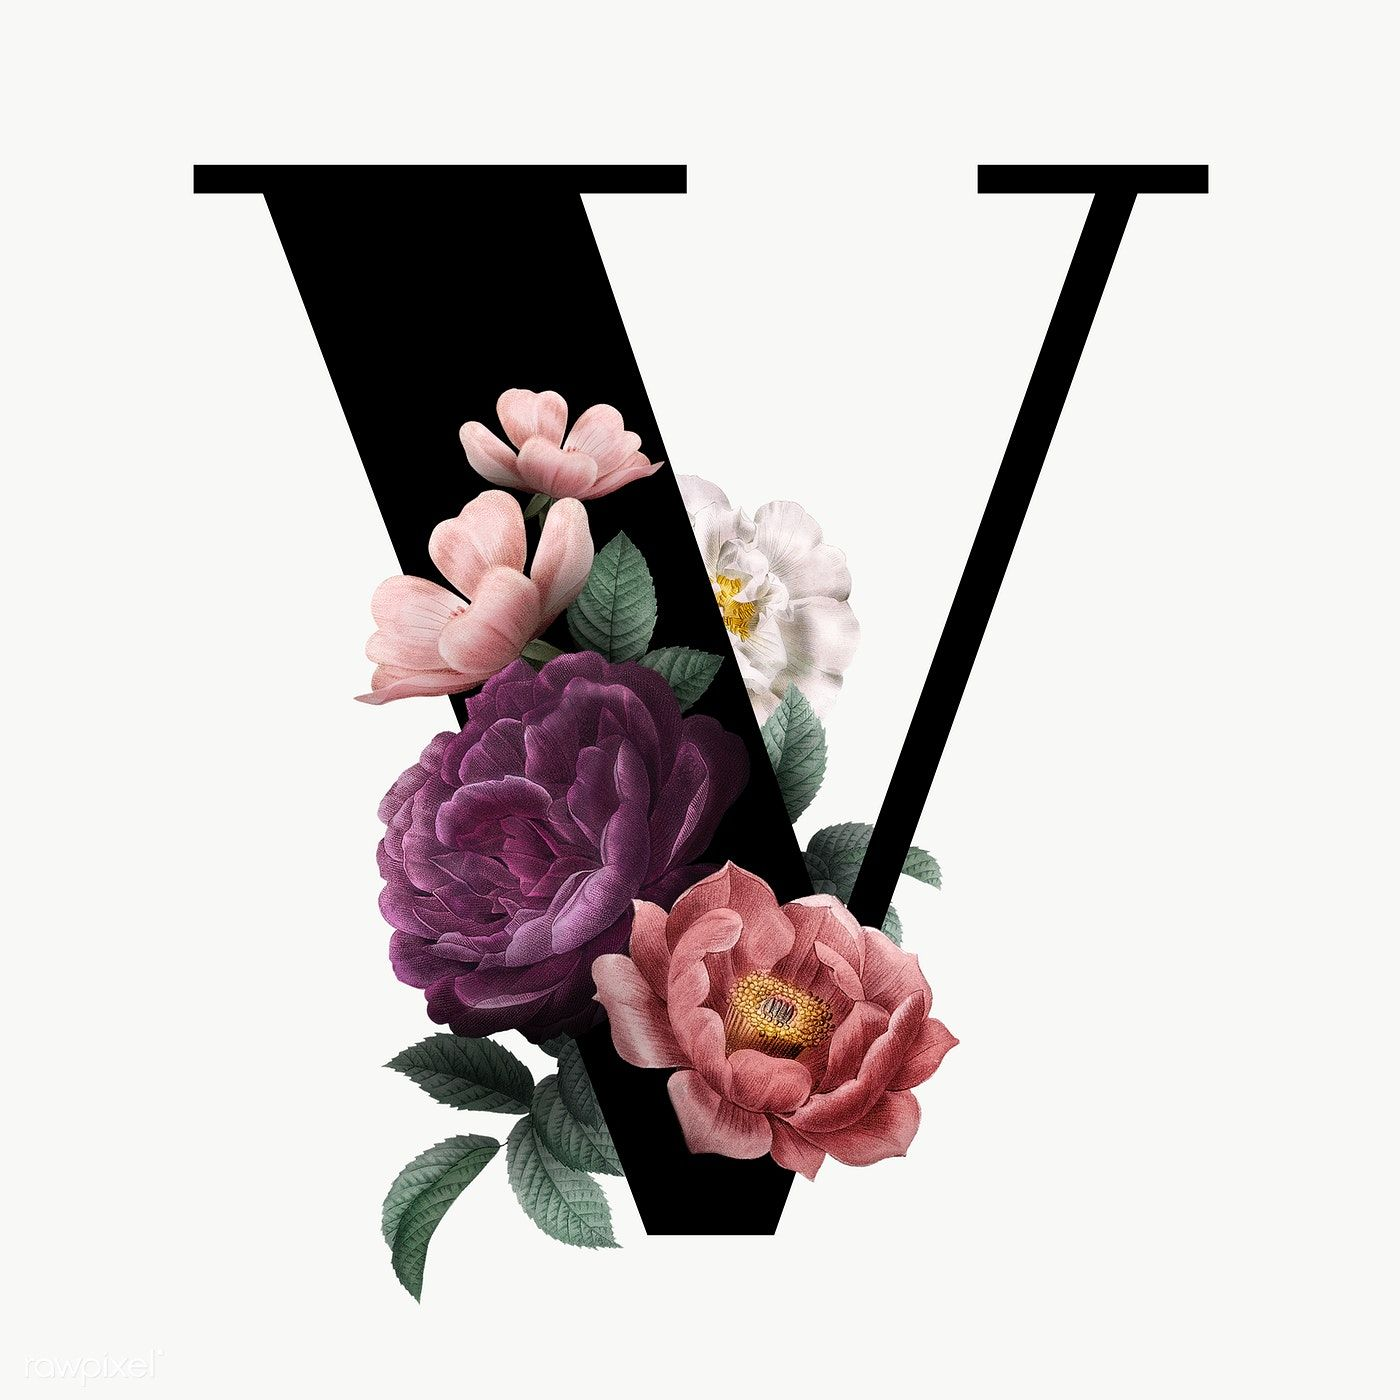 Classic And Elegant Floral Alphabet Font Letter V Transparent Png Free Image By Rawpixel Com Manota Lettering Fonts Fonts Alphabet Lettering Alphabet Fonts